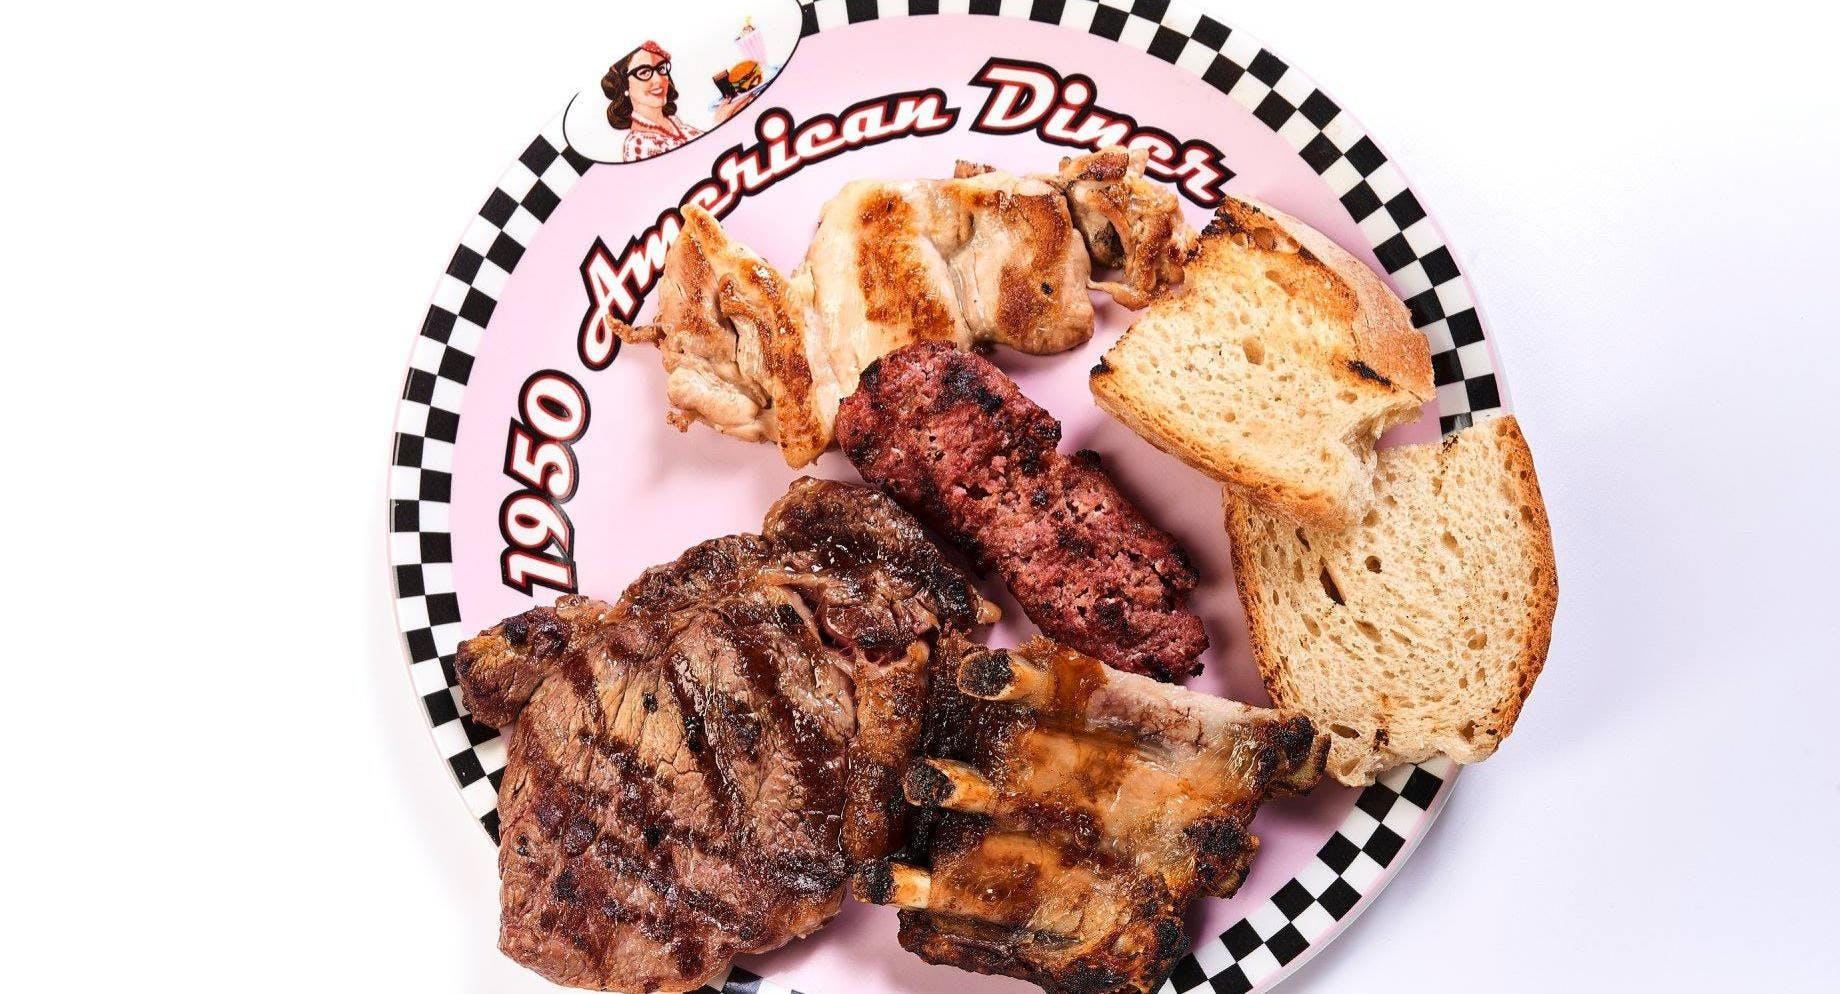 1950 American Diner - Calenzano